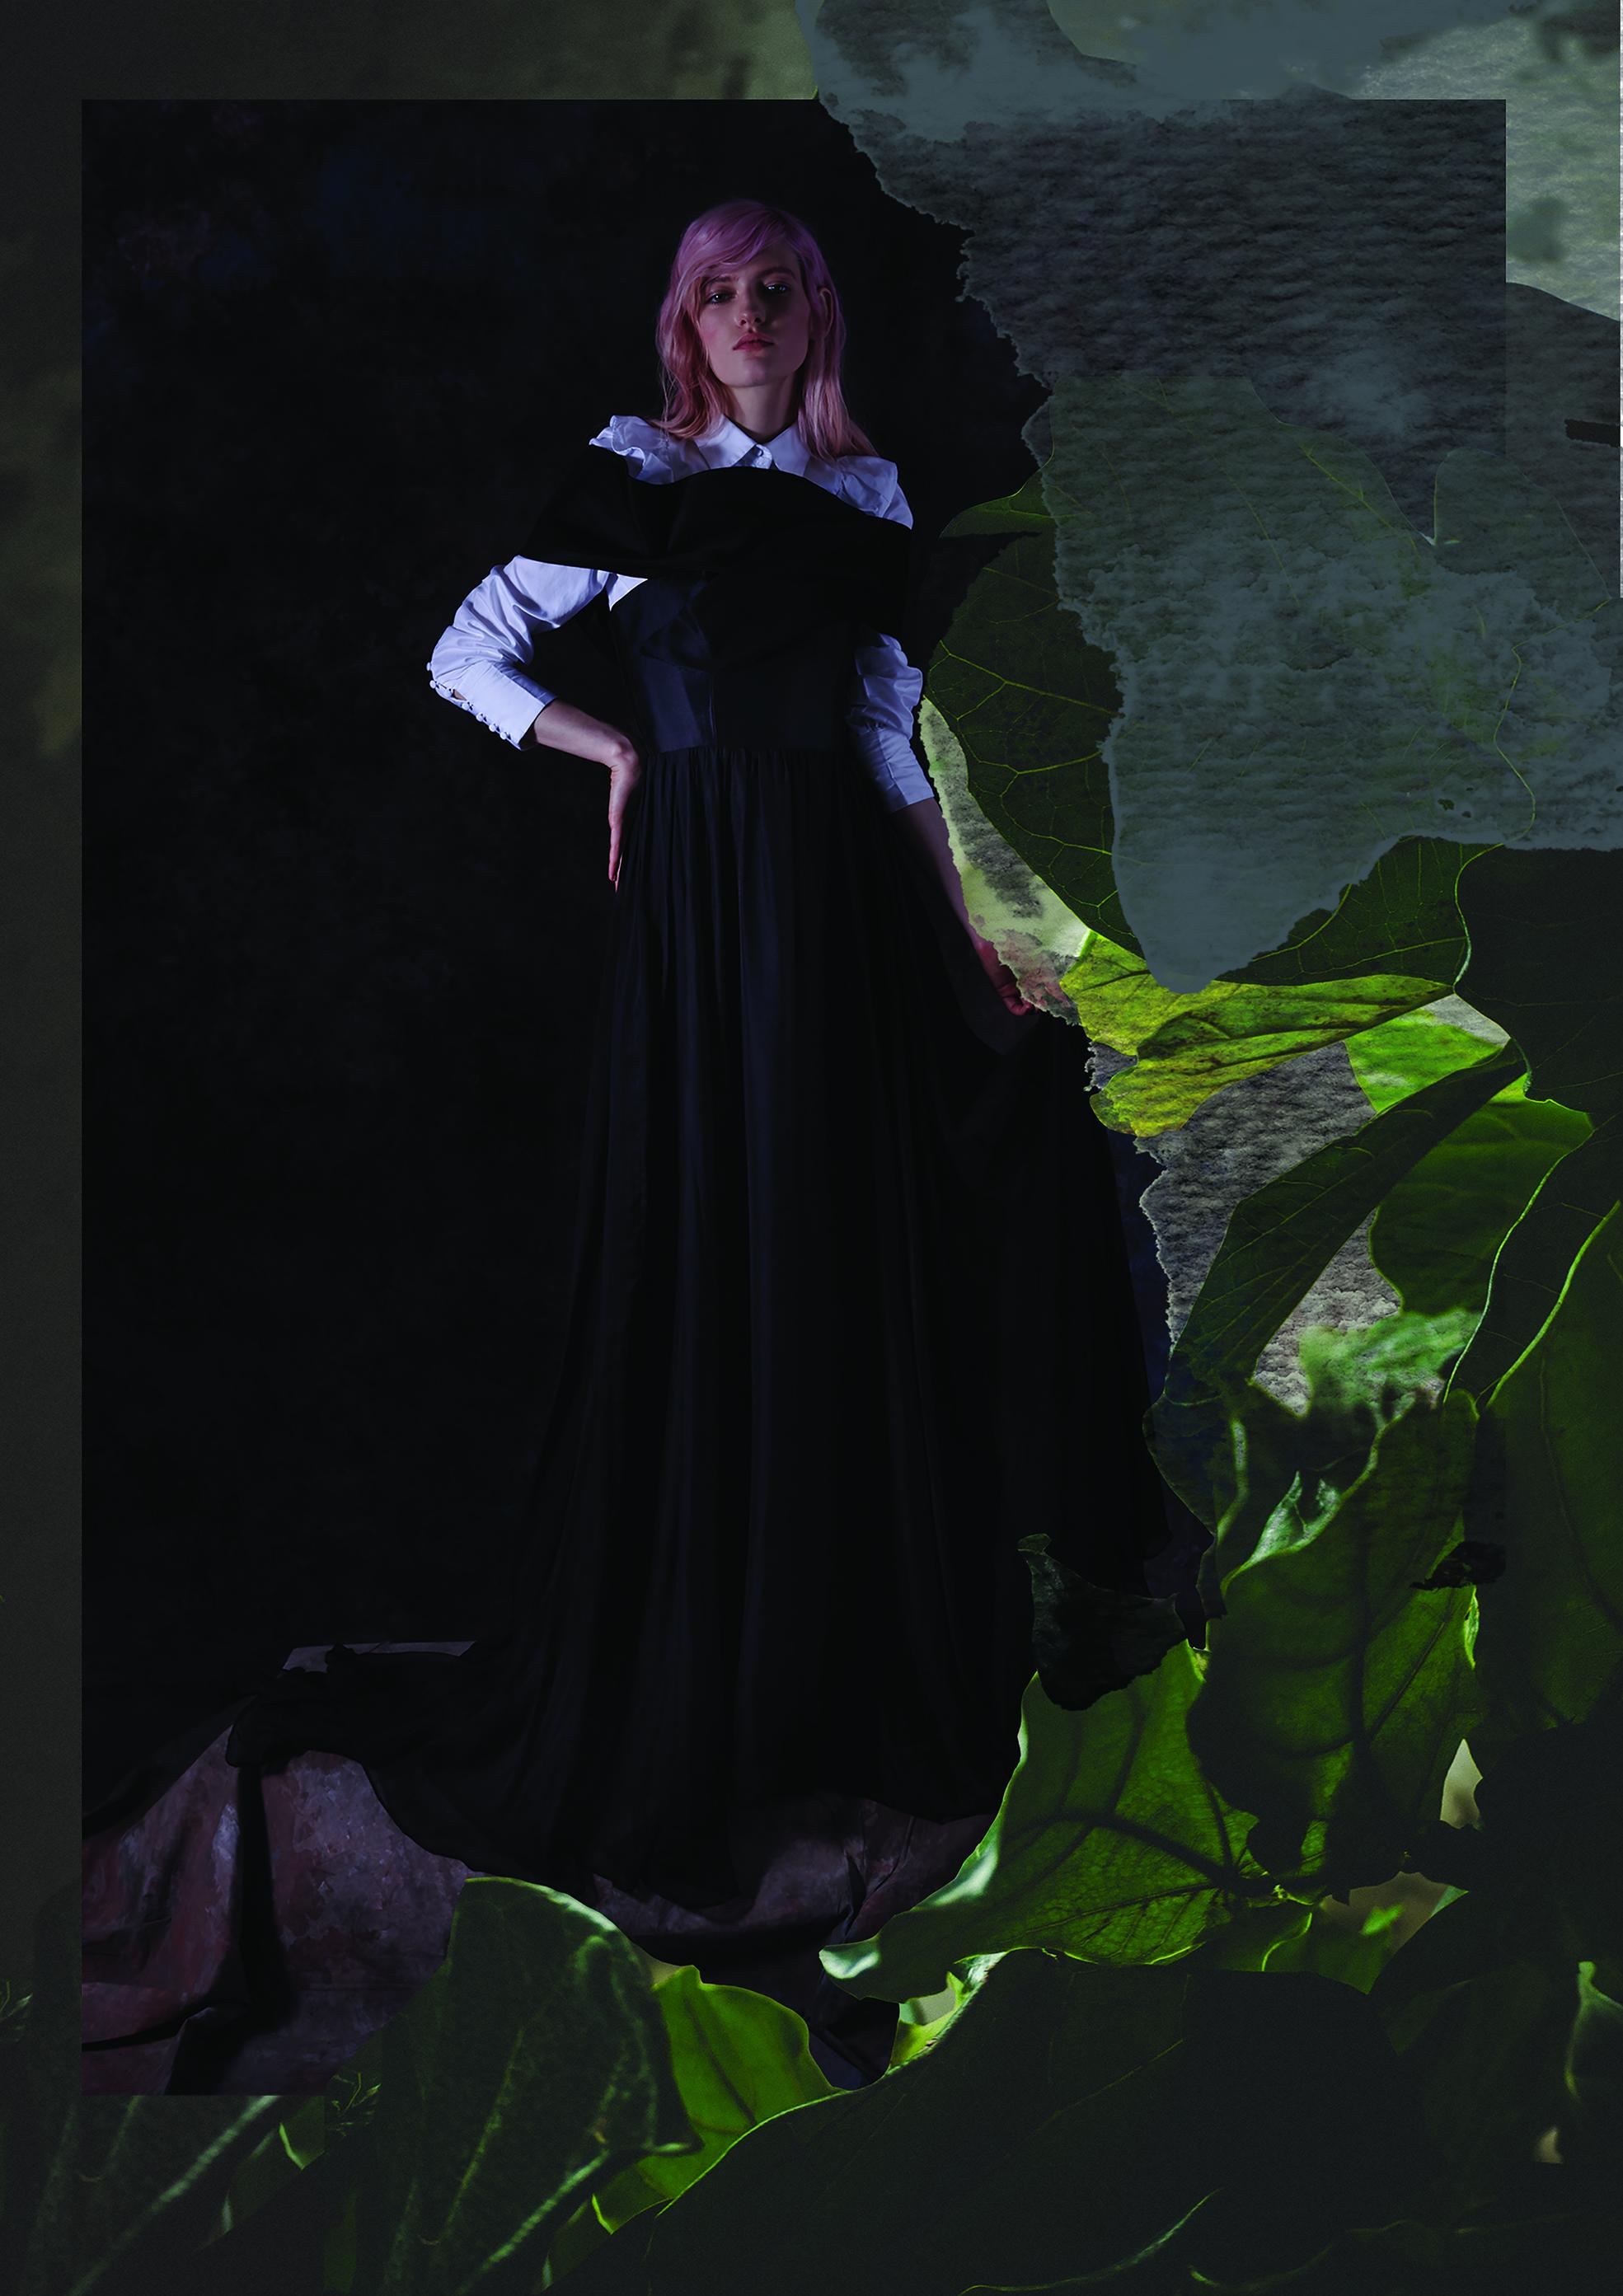 Dress FLORIANE FOSSO. Dress LEANNE MARSHALL